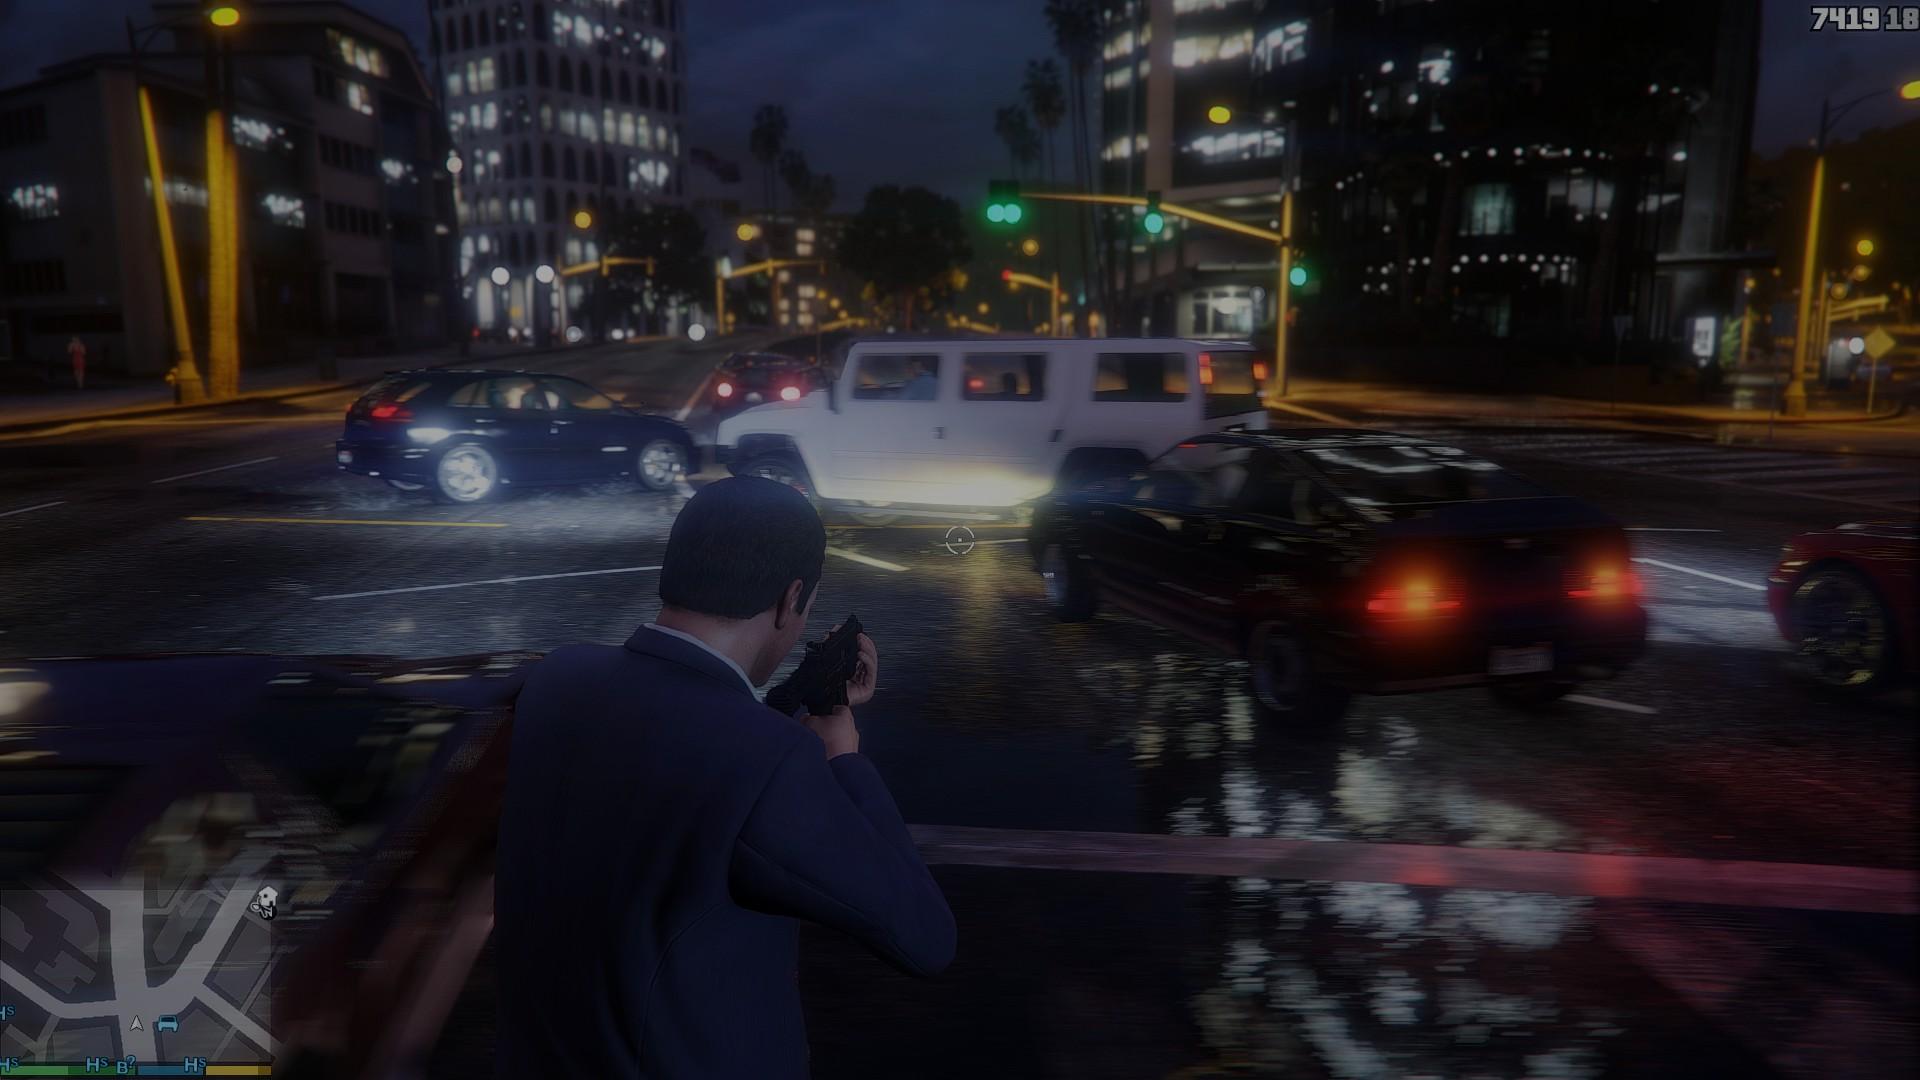 GTA 5 mod makes game look near-photorealistic - VG247